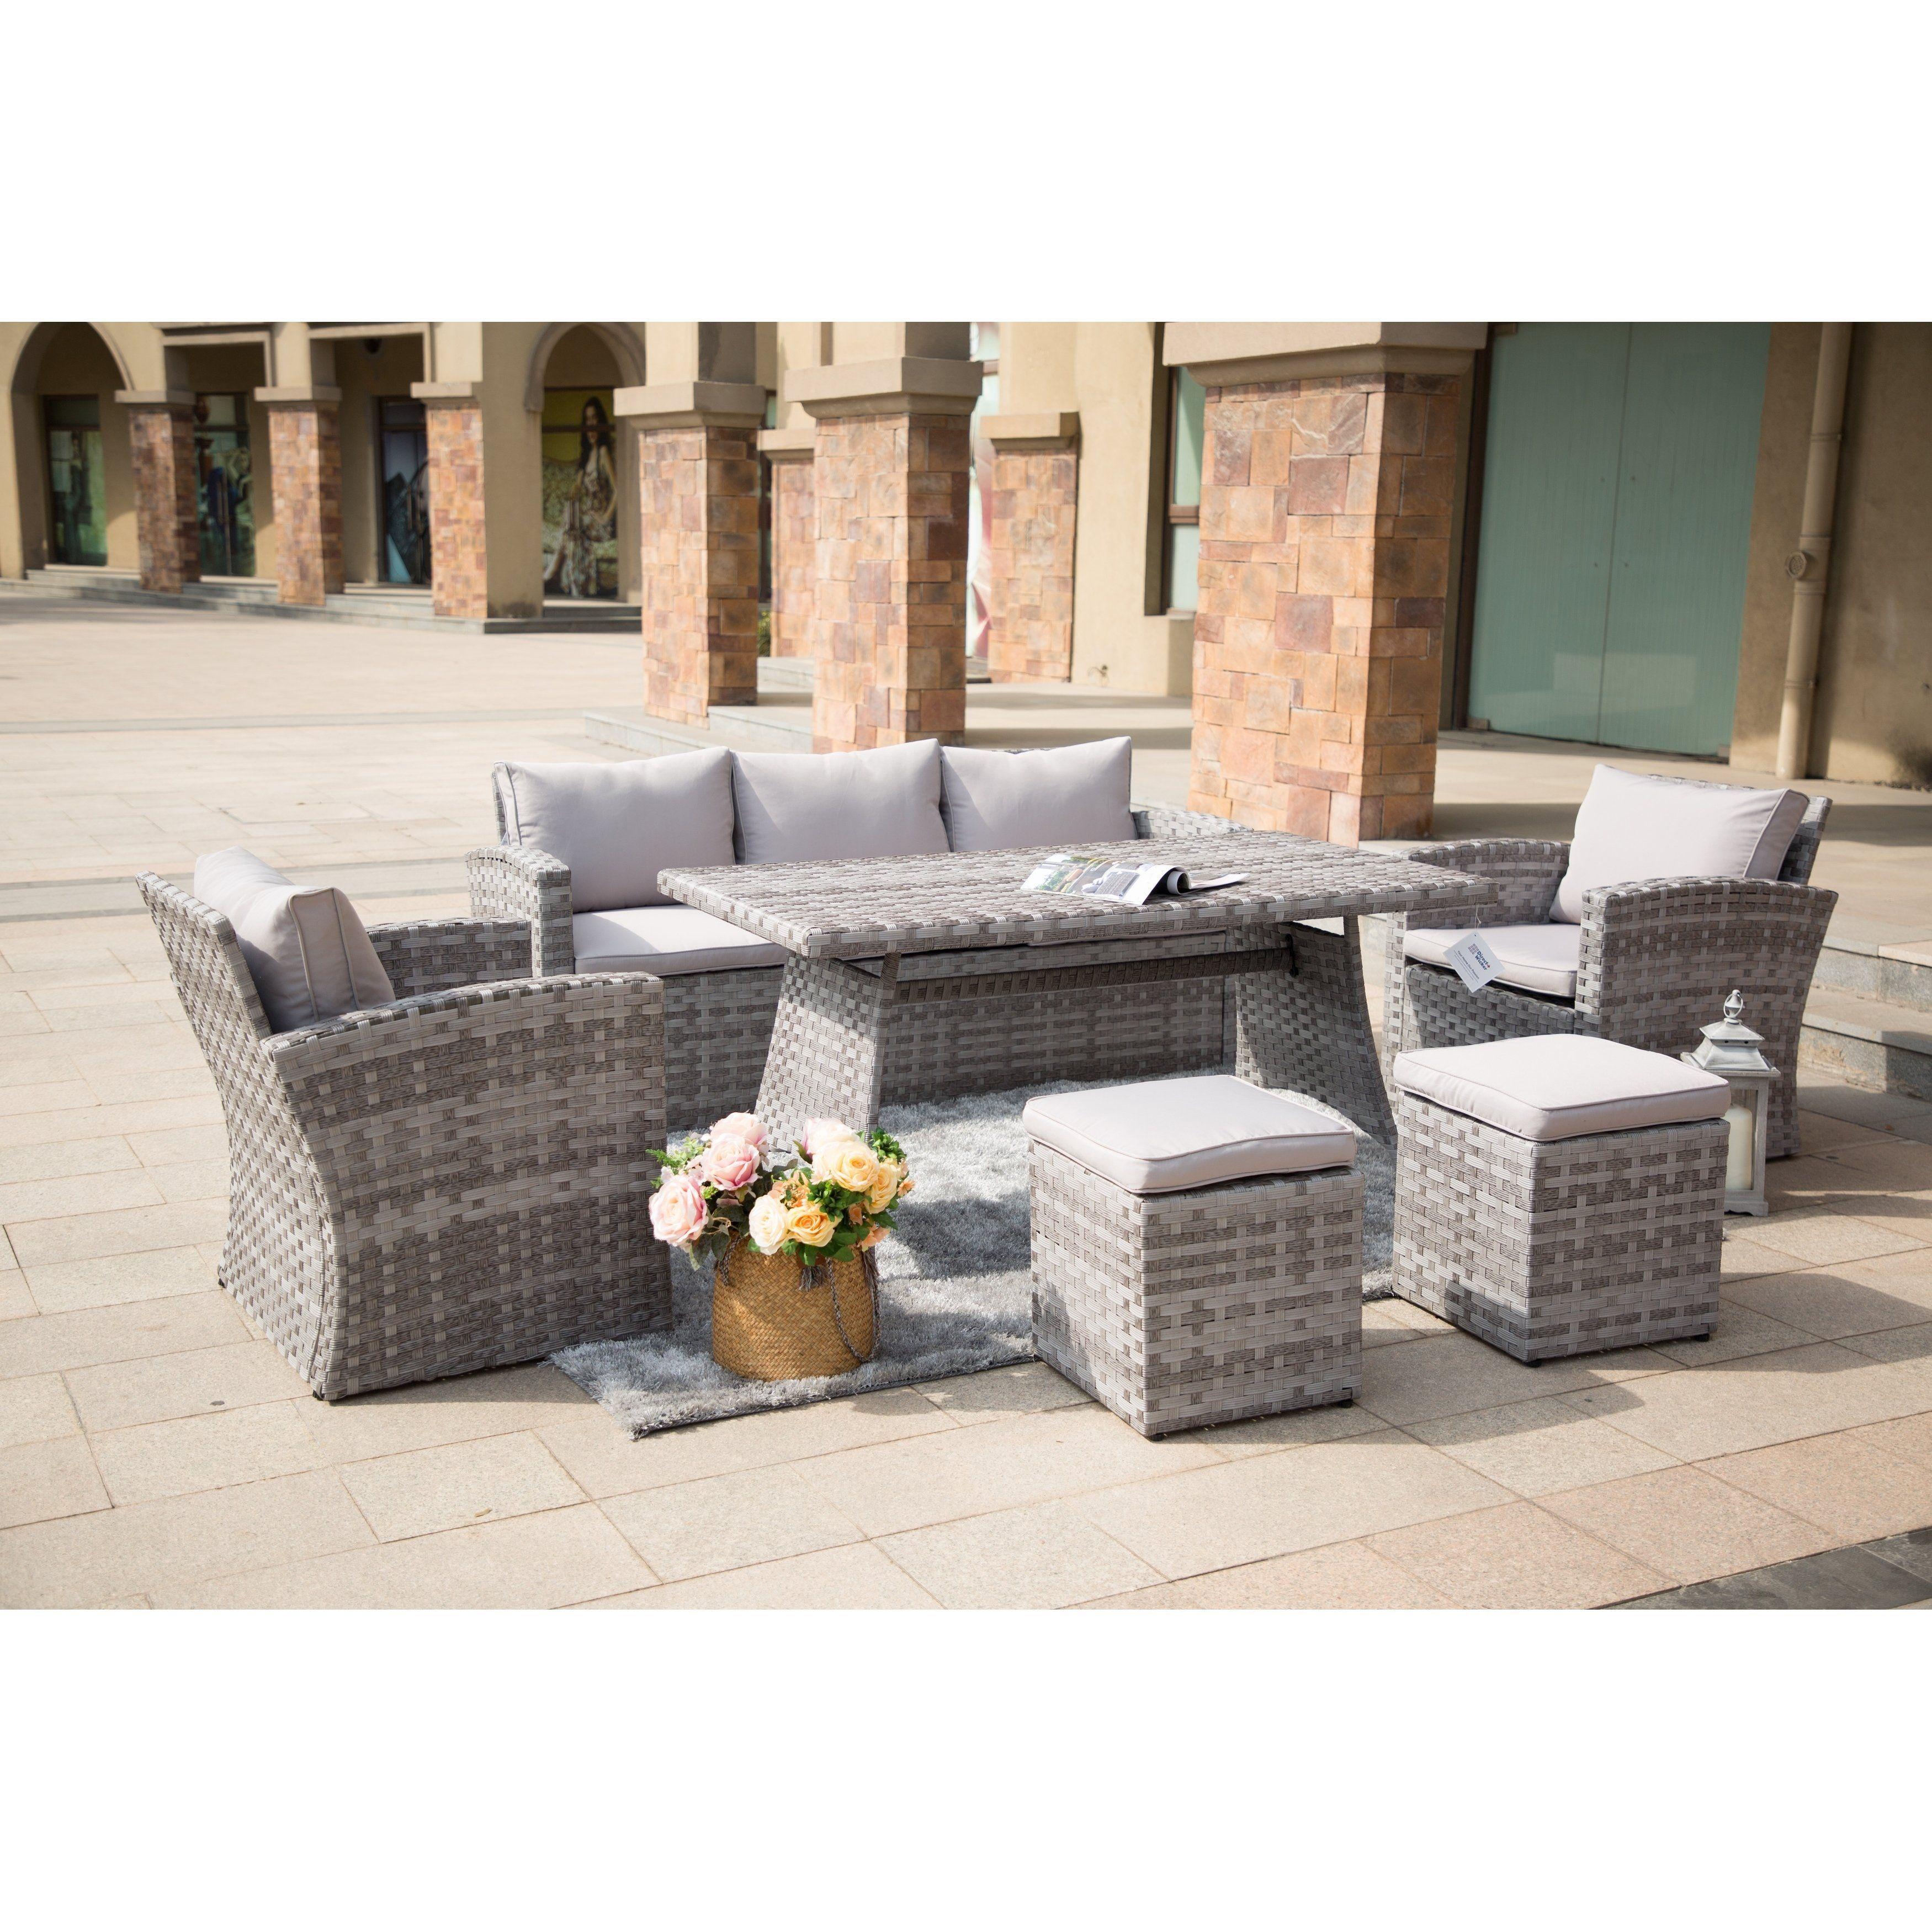 6 Piece Patio Wicker Sofa Set Outdoor Furniture By Moda